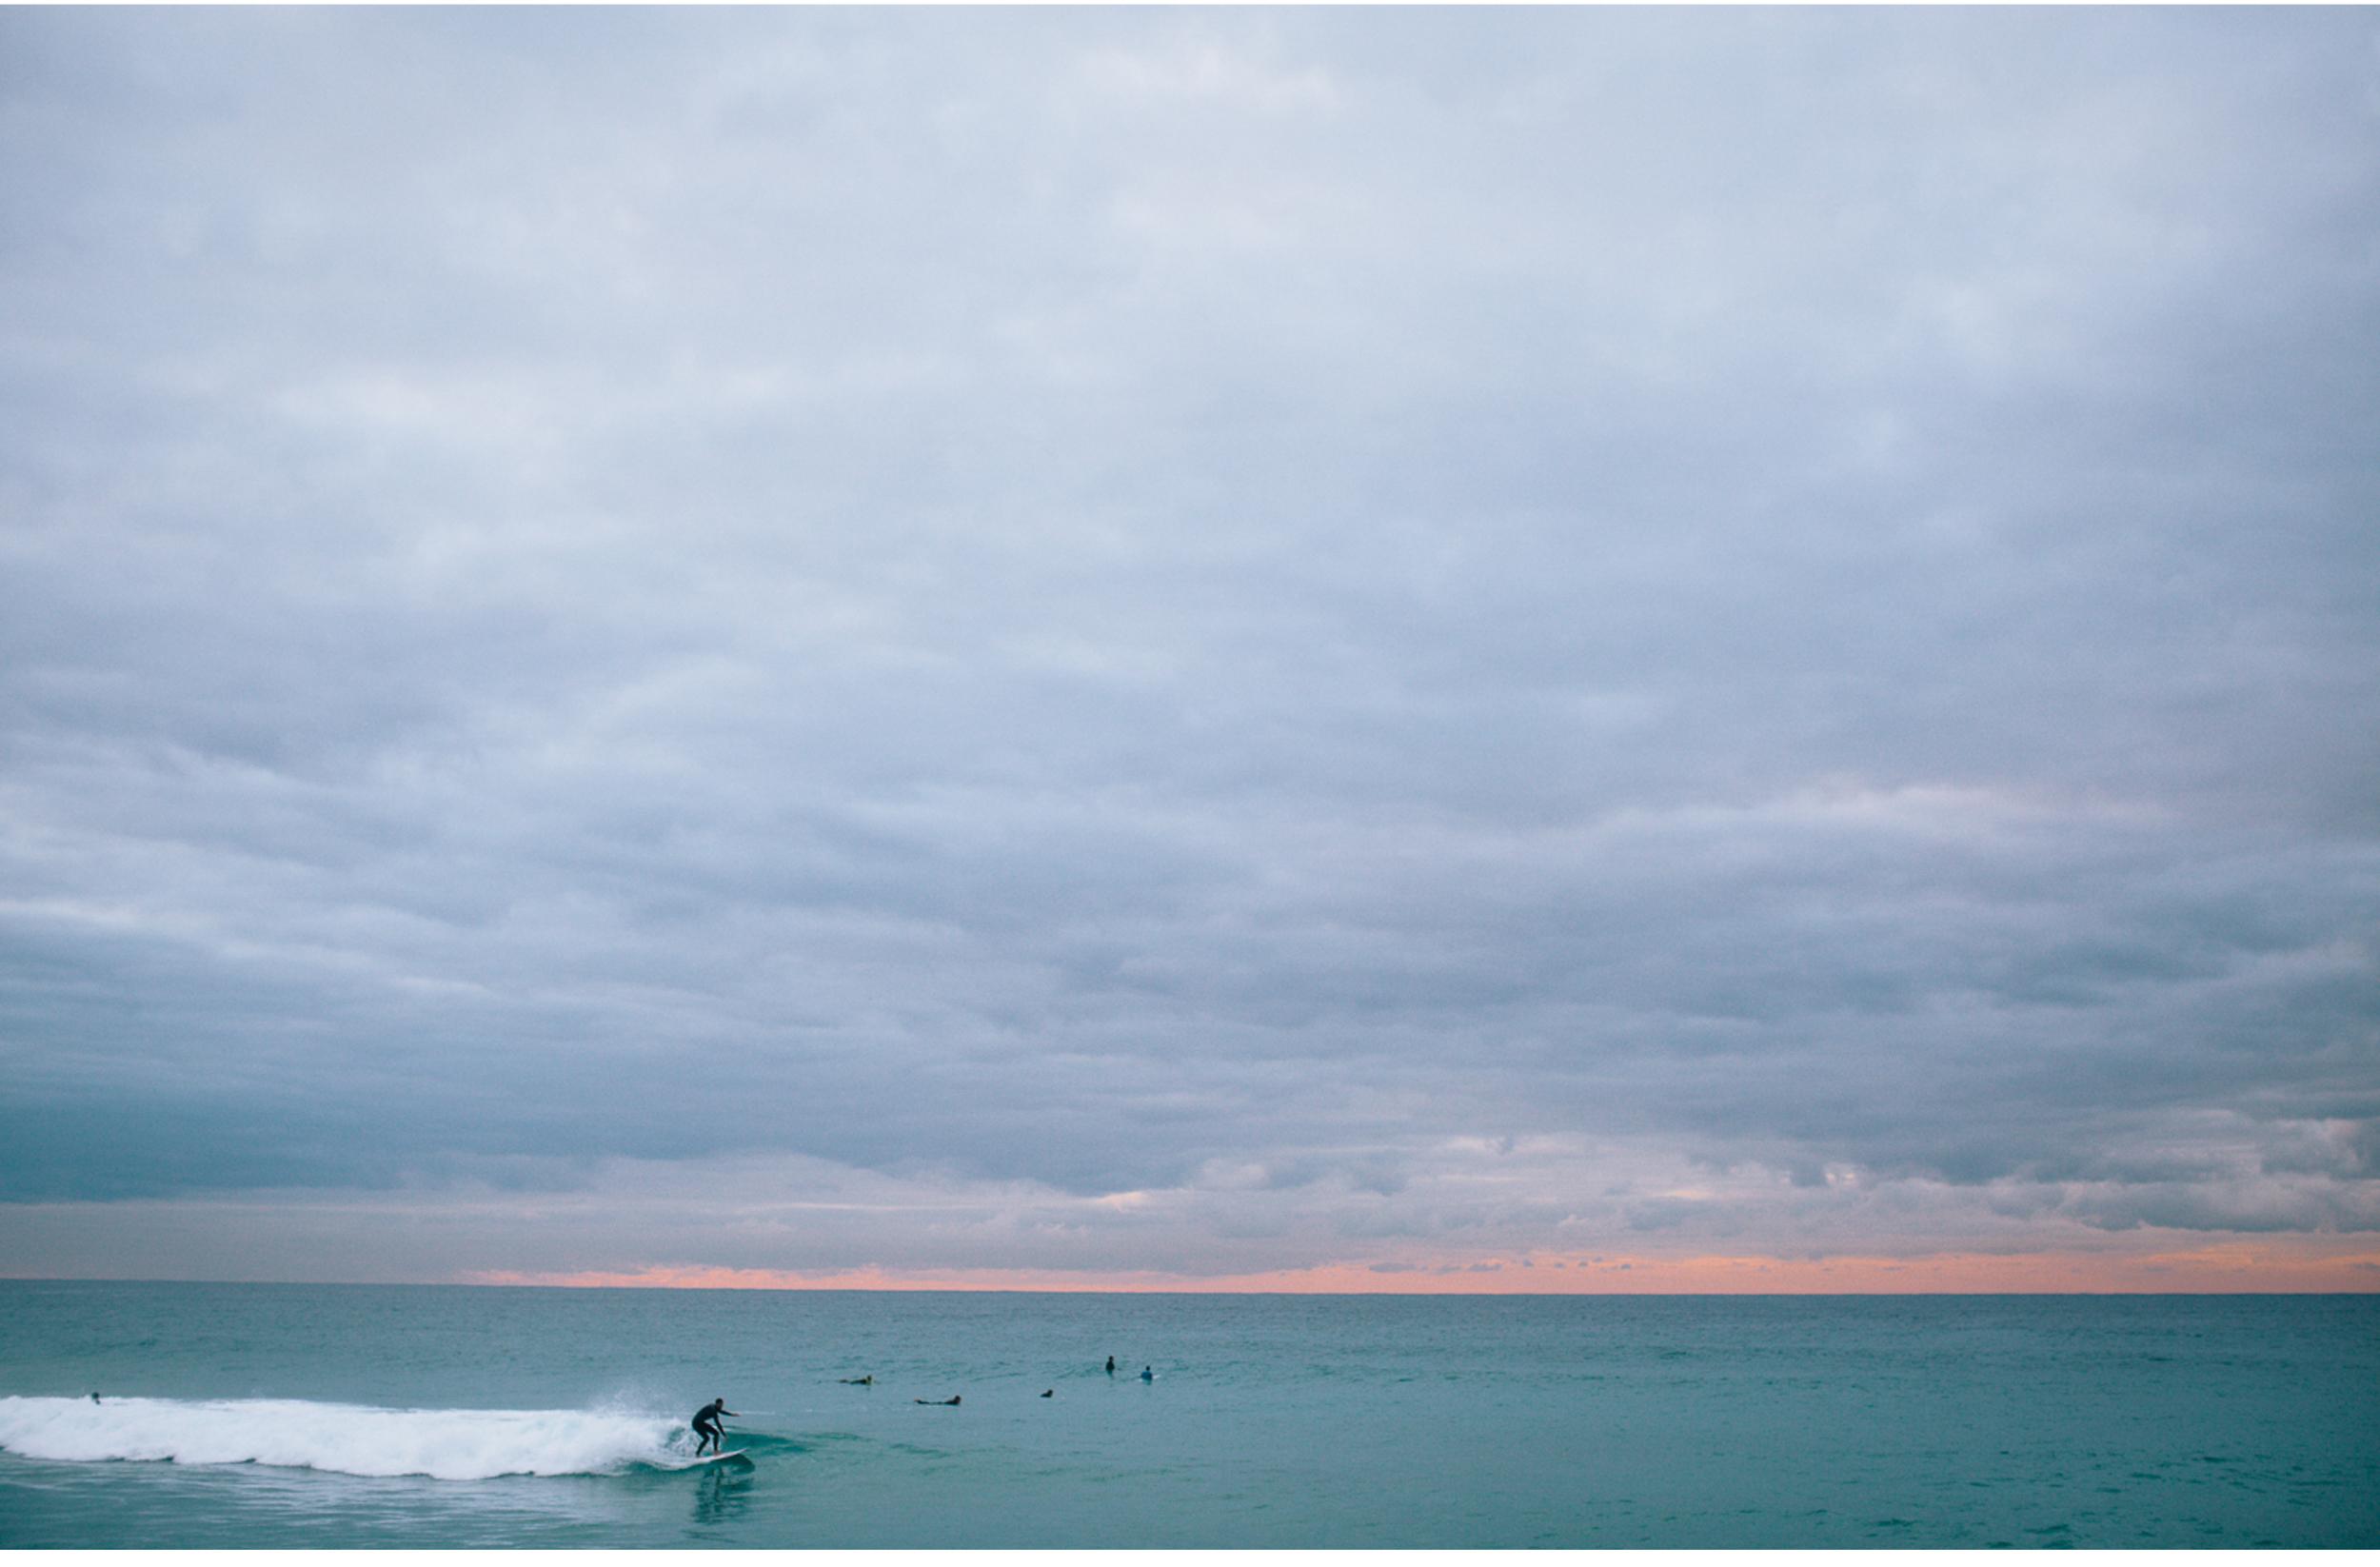 sheridan_nilsson_bronte_beach.04.jpg